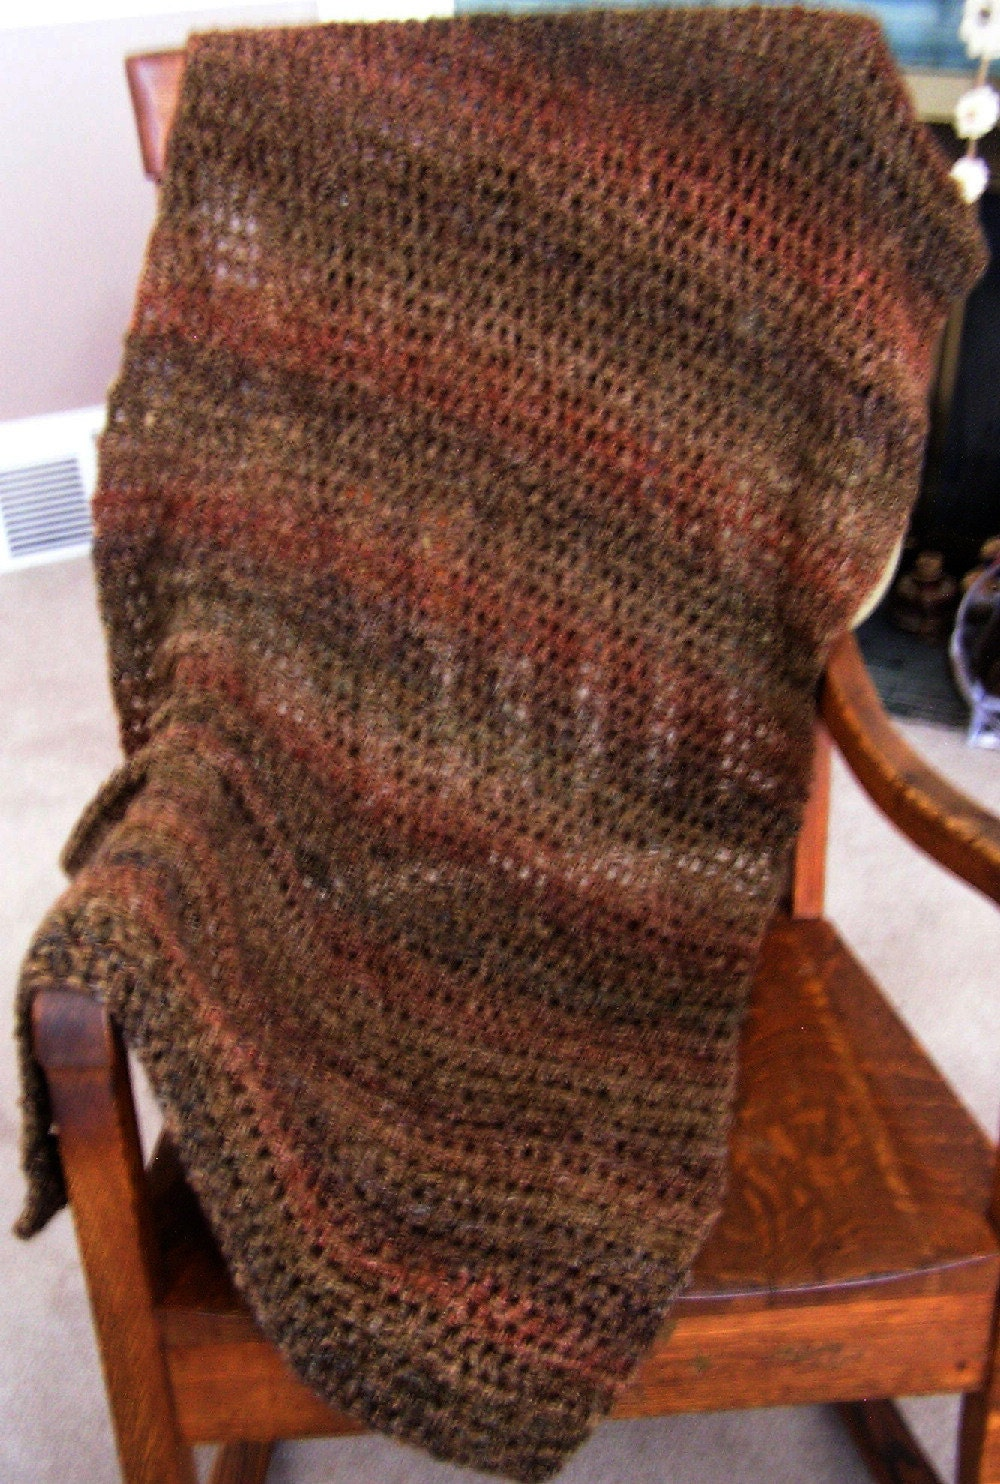 Crochet Scarf Patterns With Homespun Yarn : new shawl wrap afghan prayer chemo lion brand homespun yarn